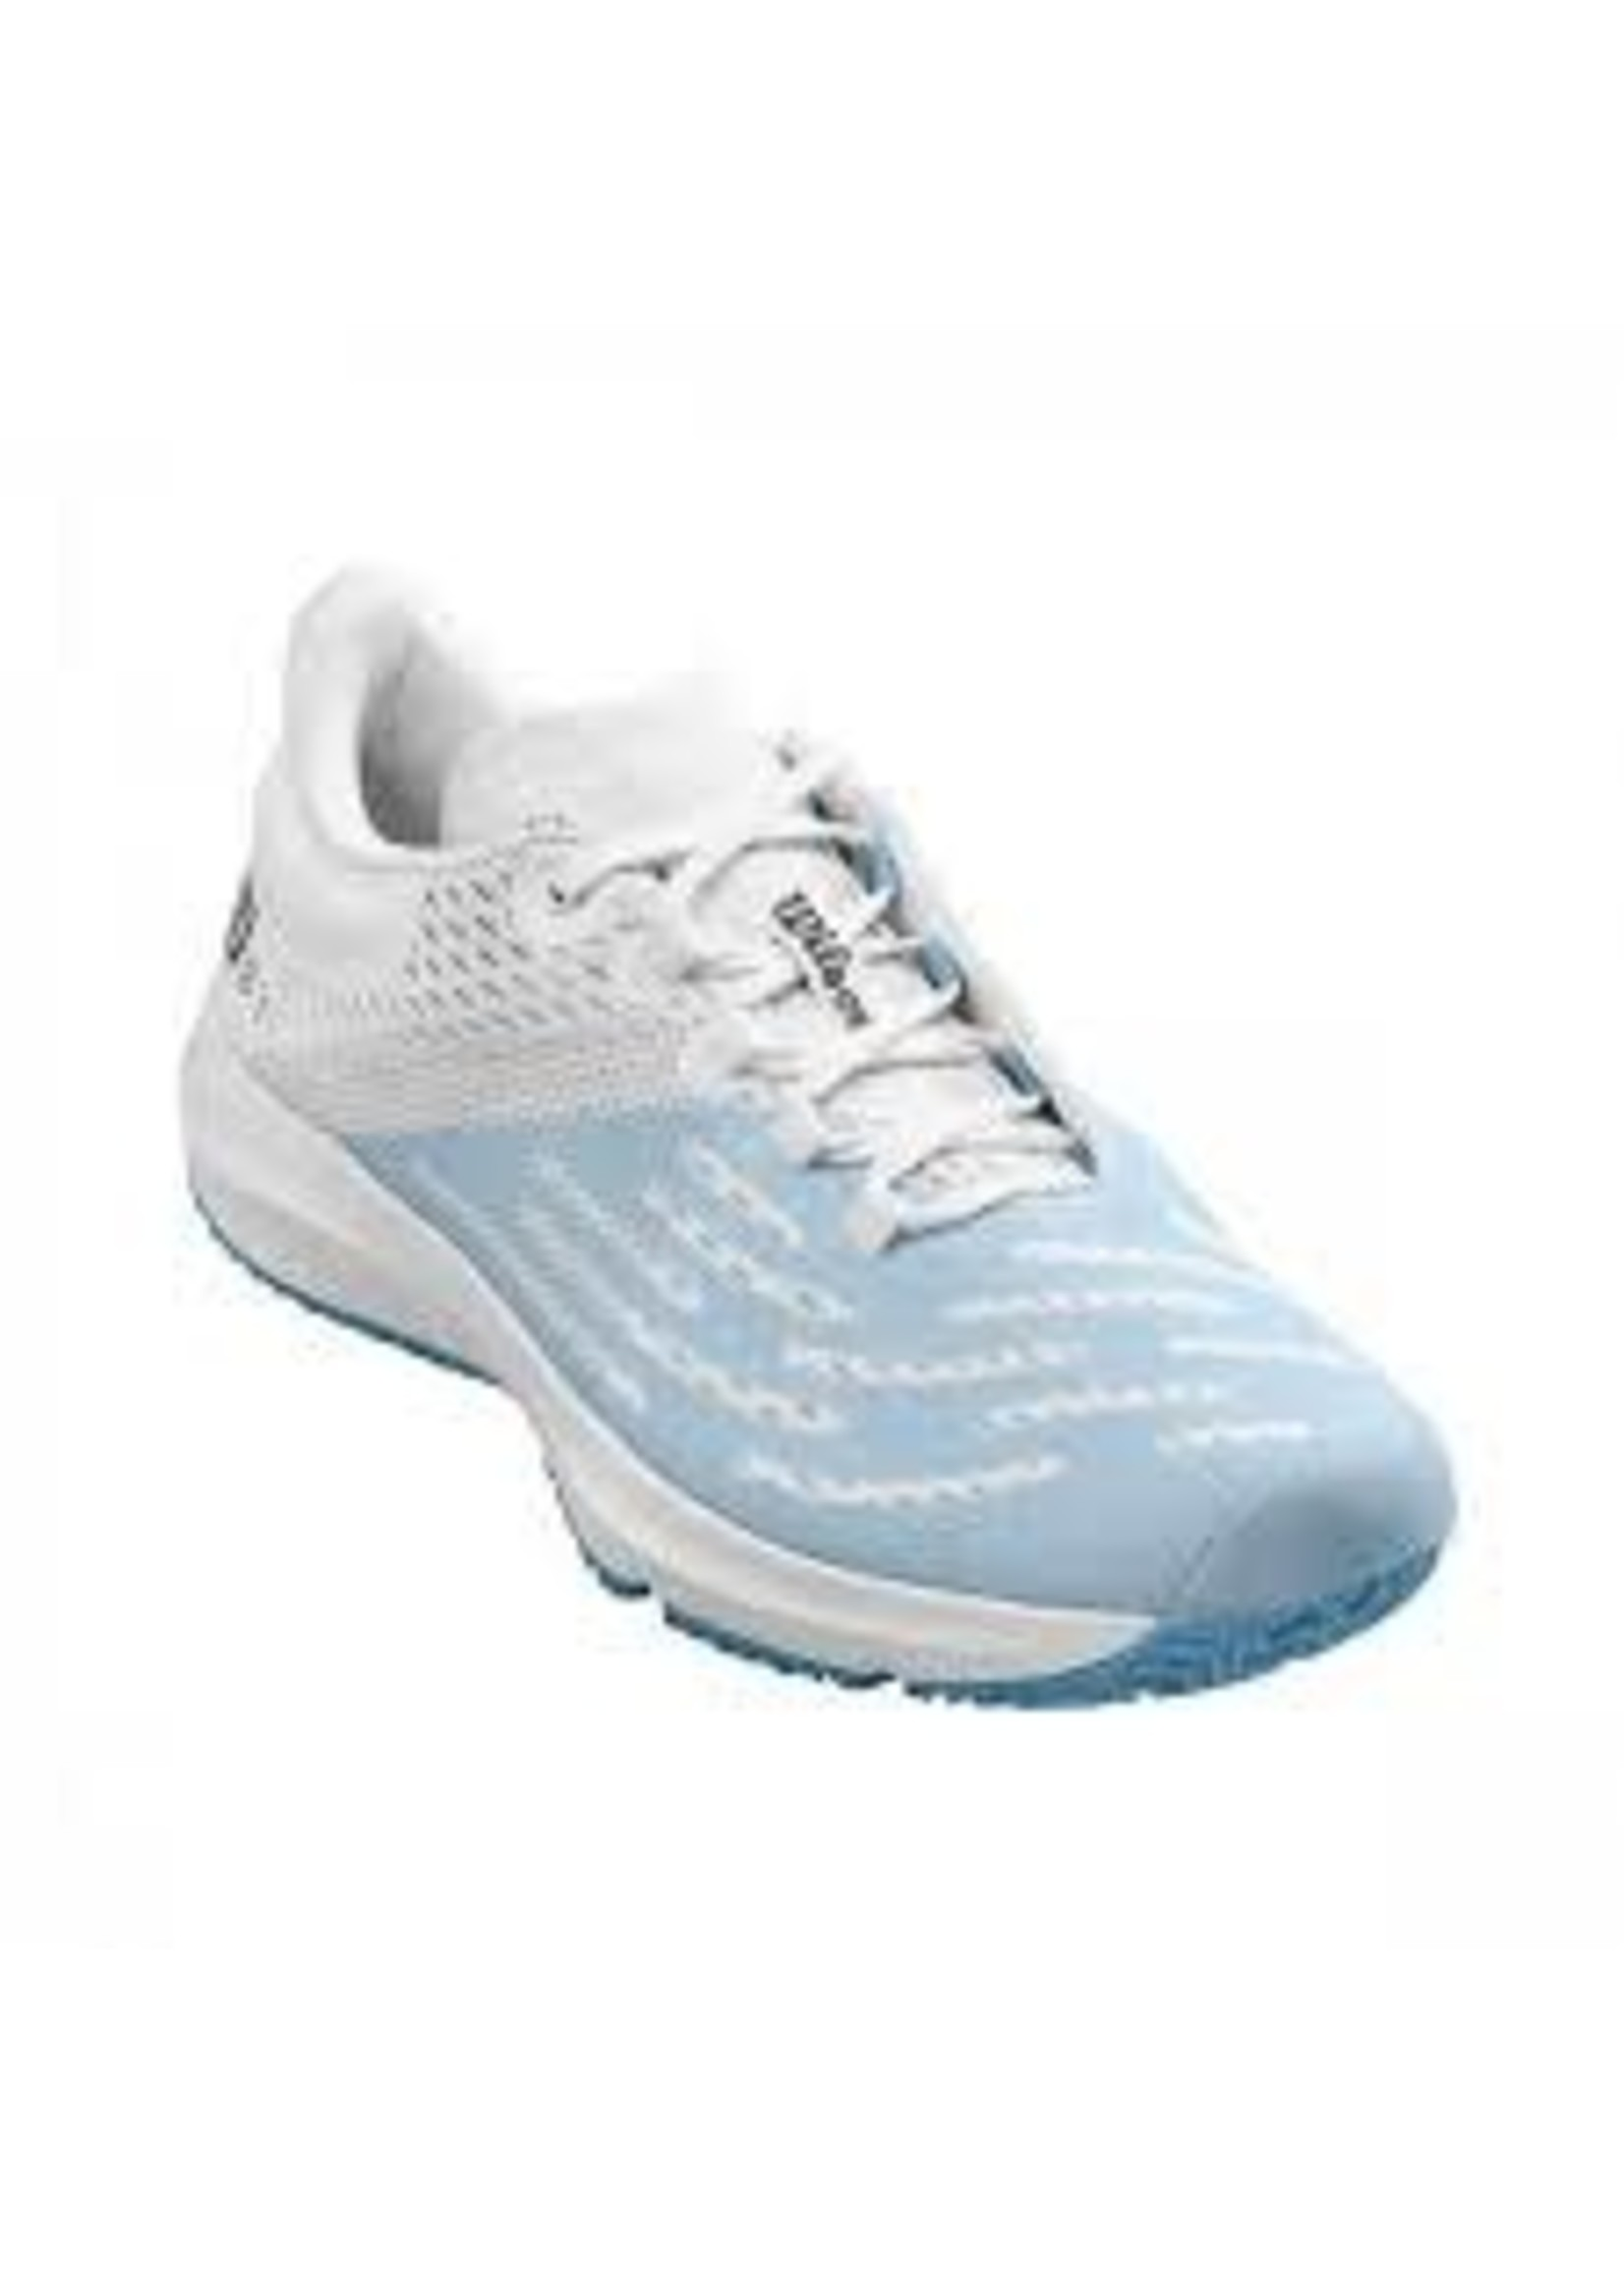 Wilson Wilson Kaos 3.0 Ladies Tennis Shoe (2021)